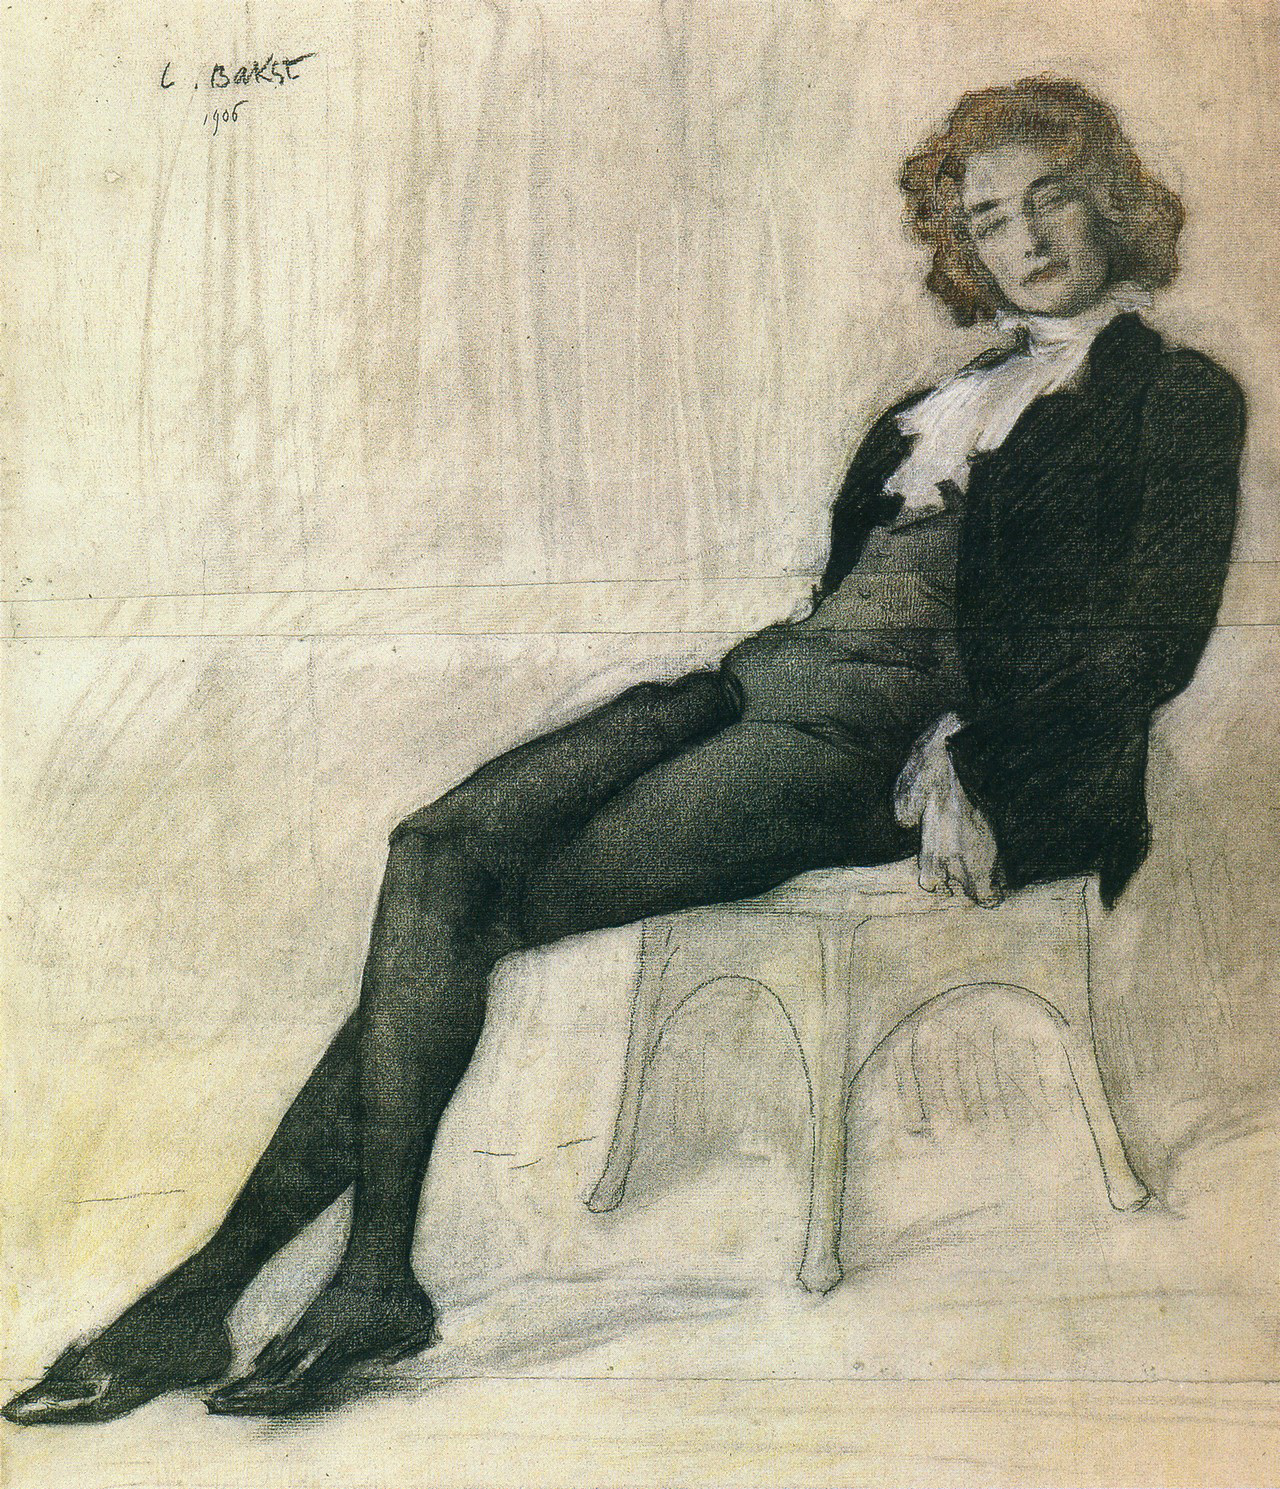 Retrato de Guíppius por Leon Bakst, 1906